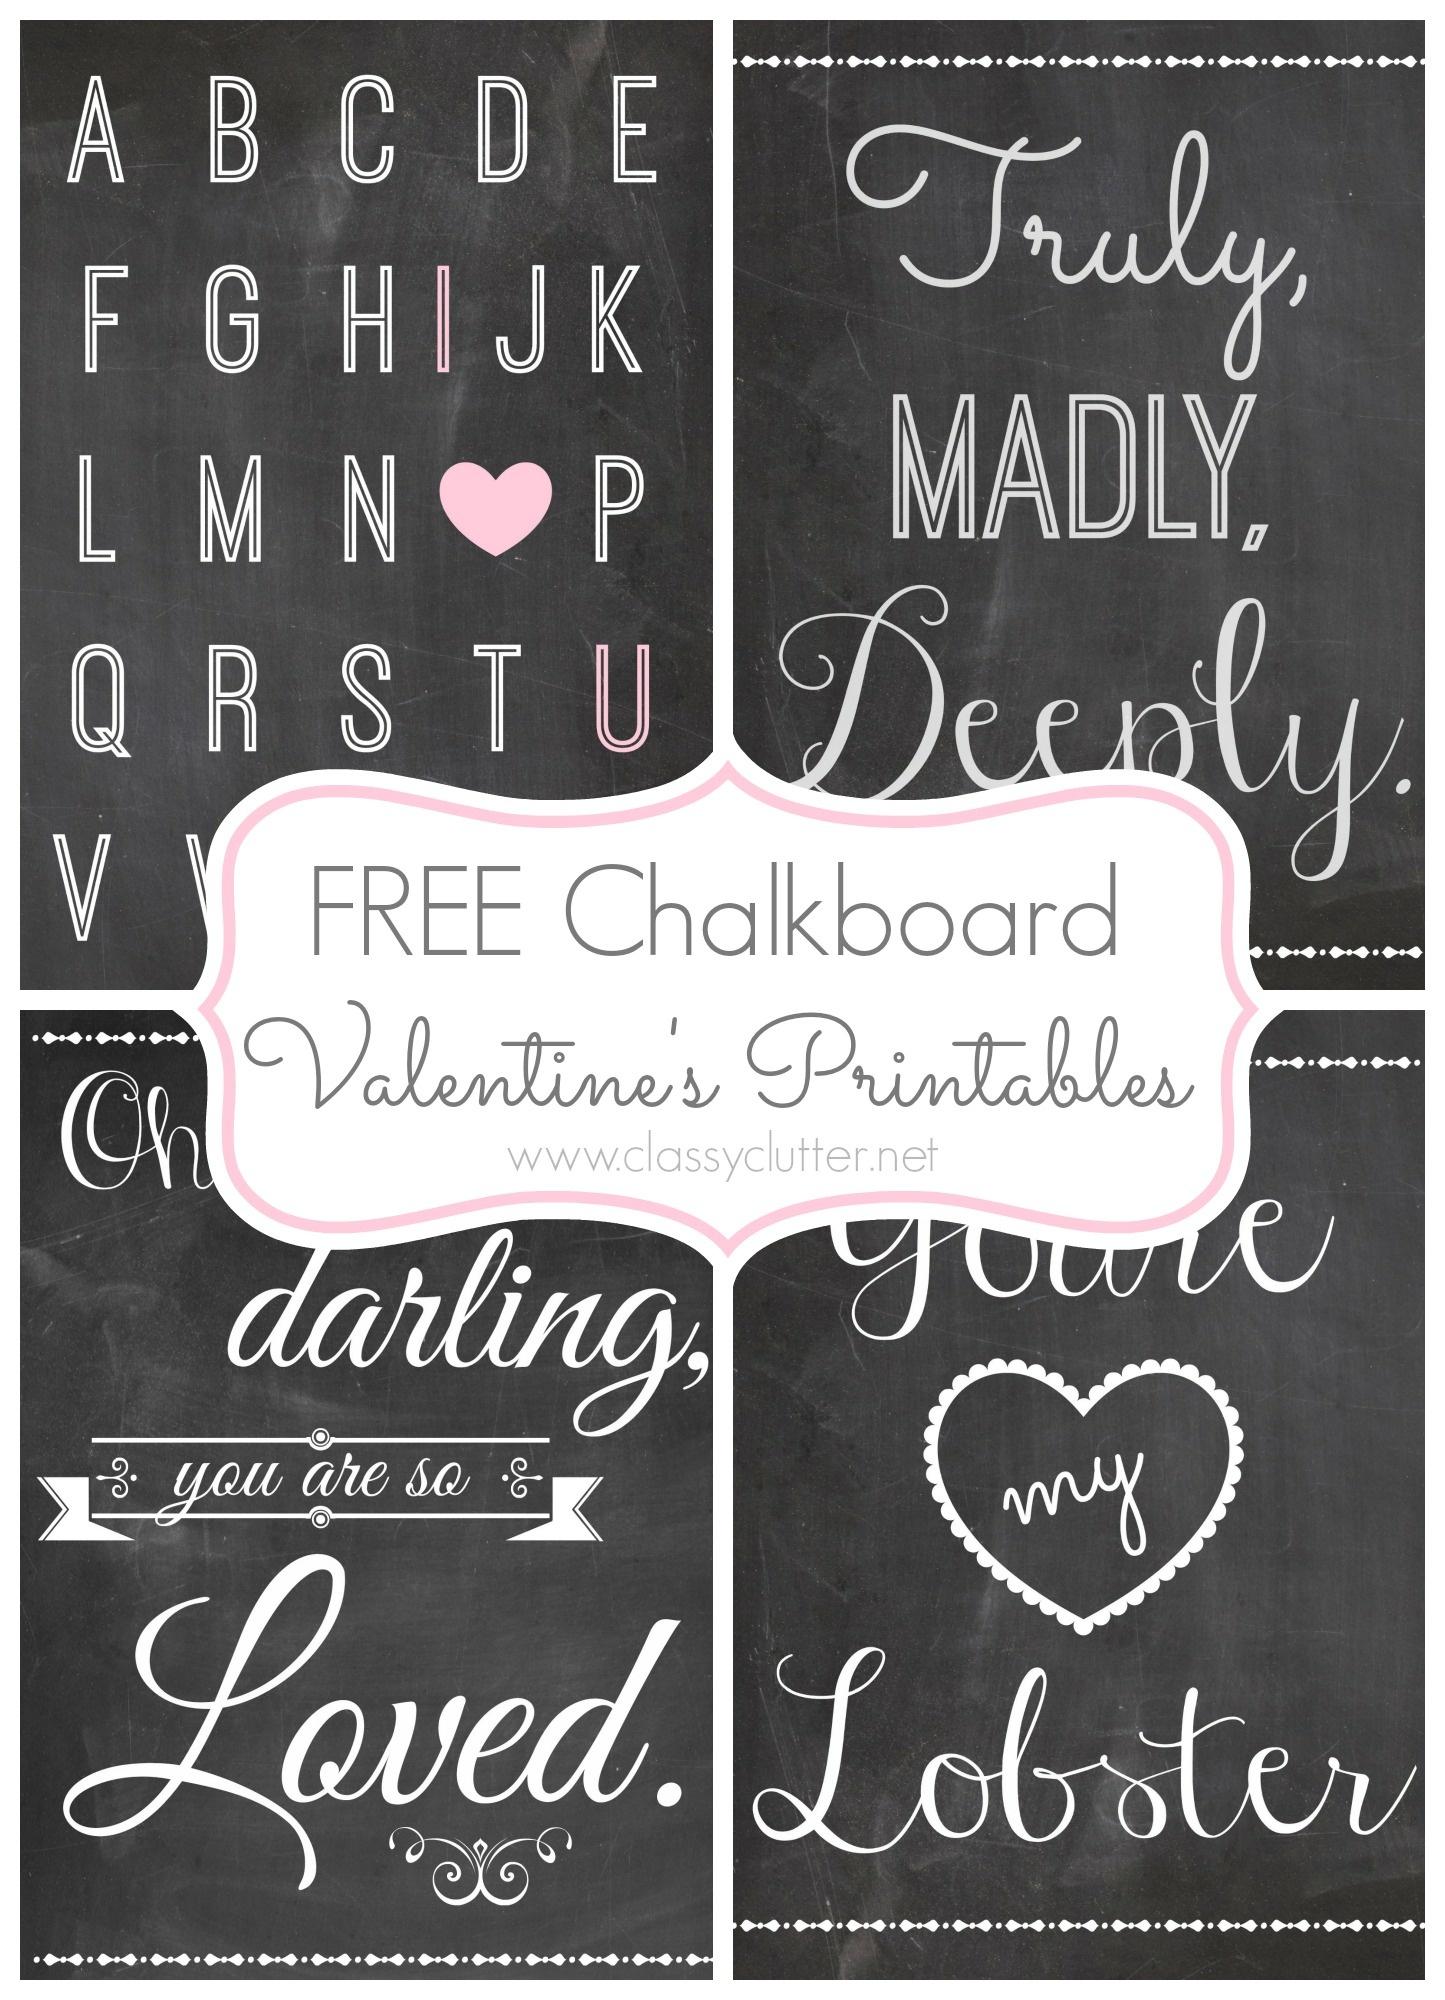 Free Valentine's Day Printables - Free Chalkboard Printables